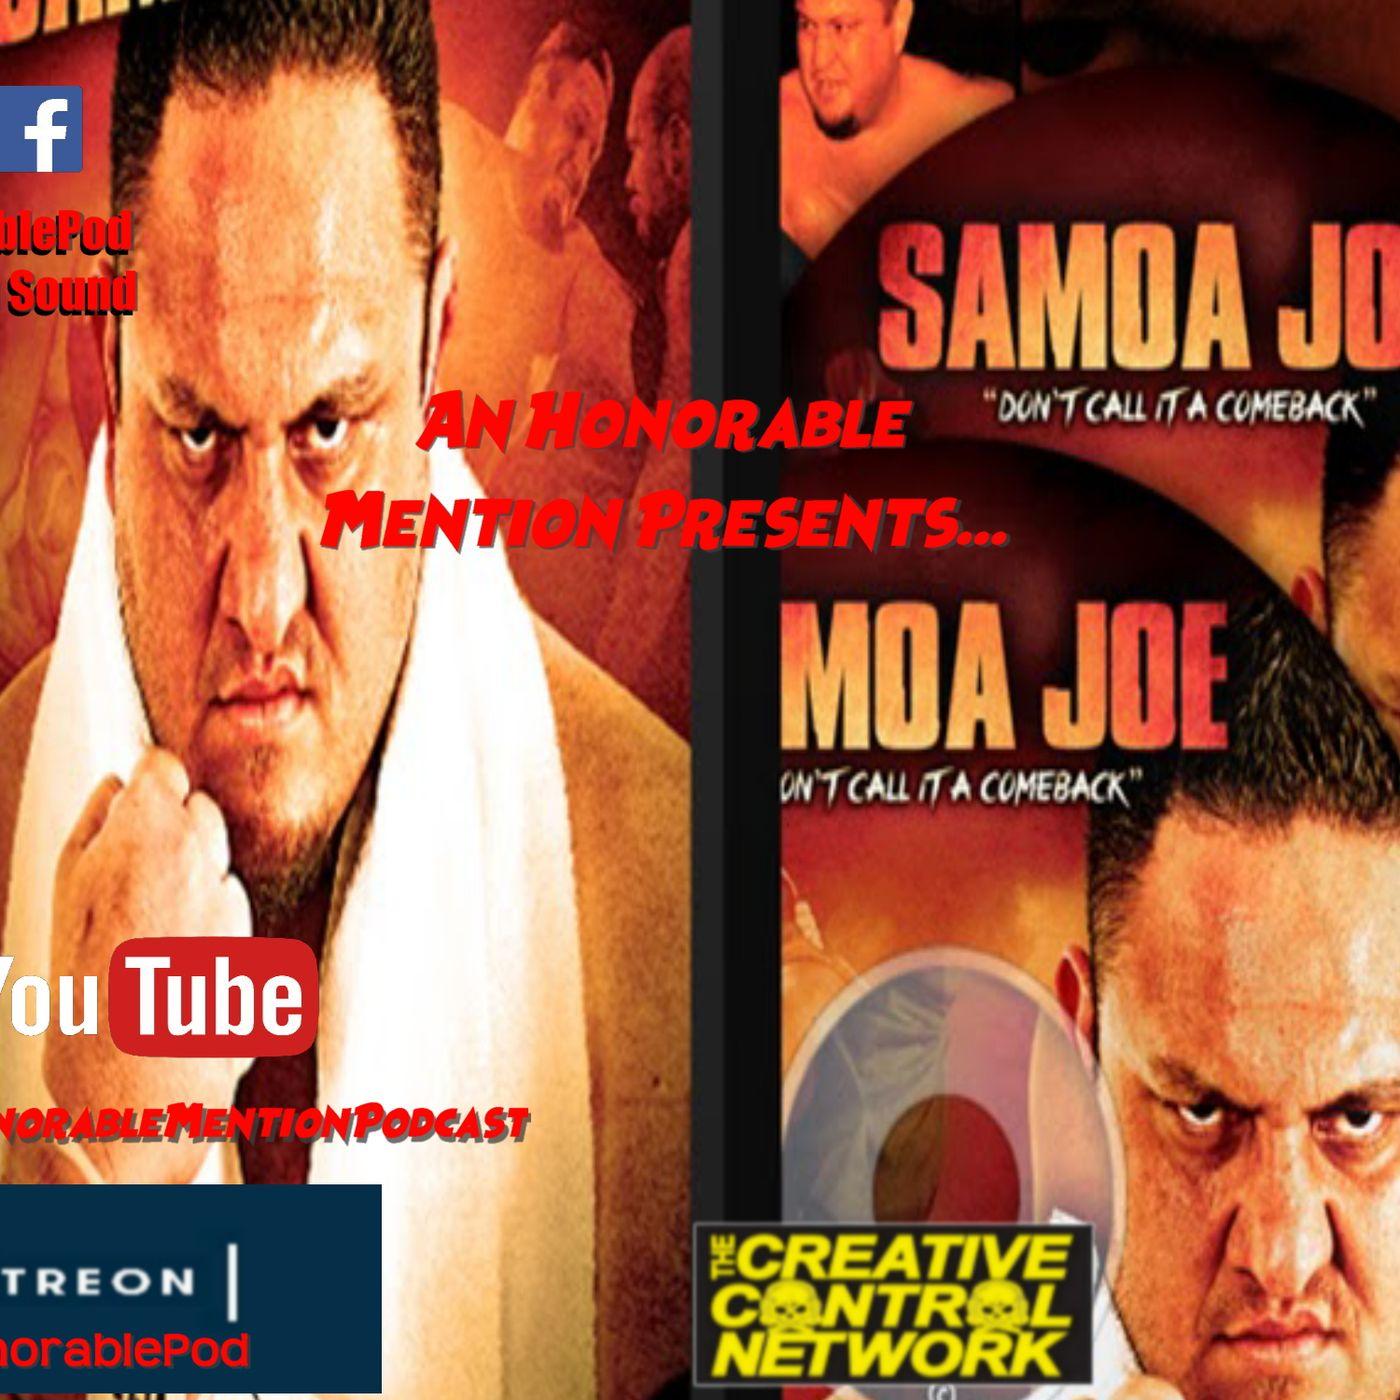 Episode 165: Samoa Joe: Don't Call it a Comeback (Sponsored by Patreon.com/AnHonorablePod)